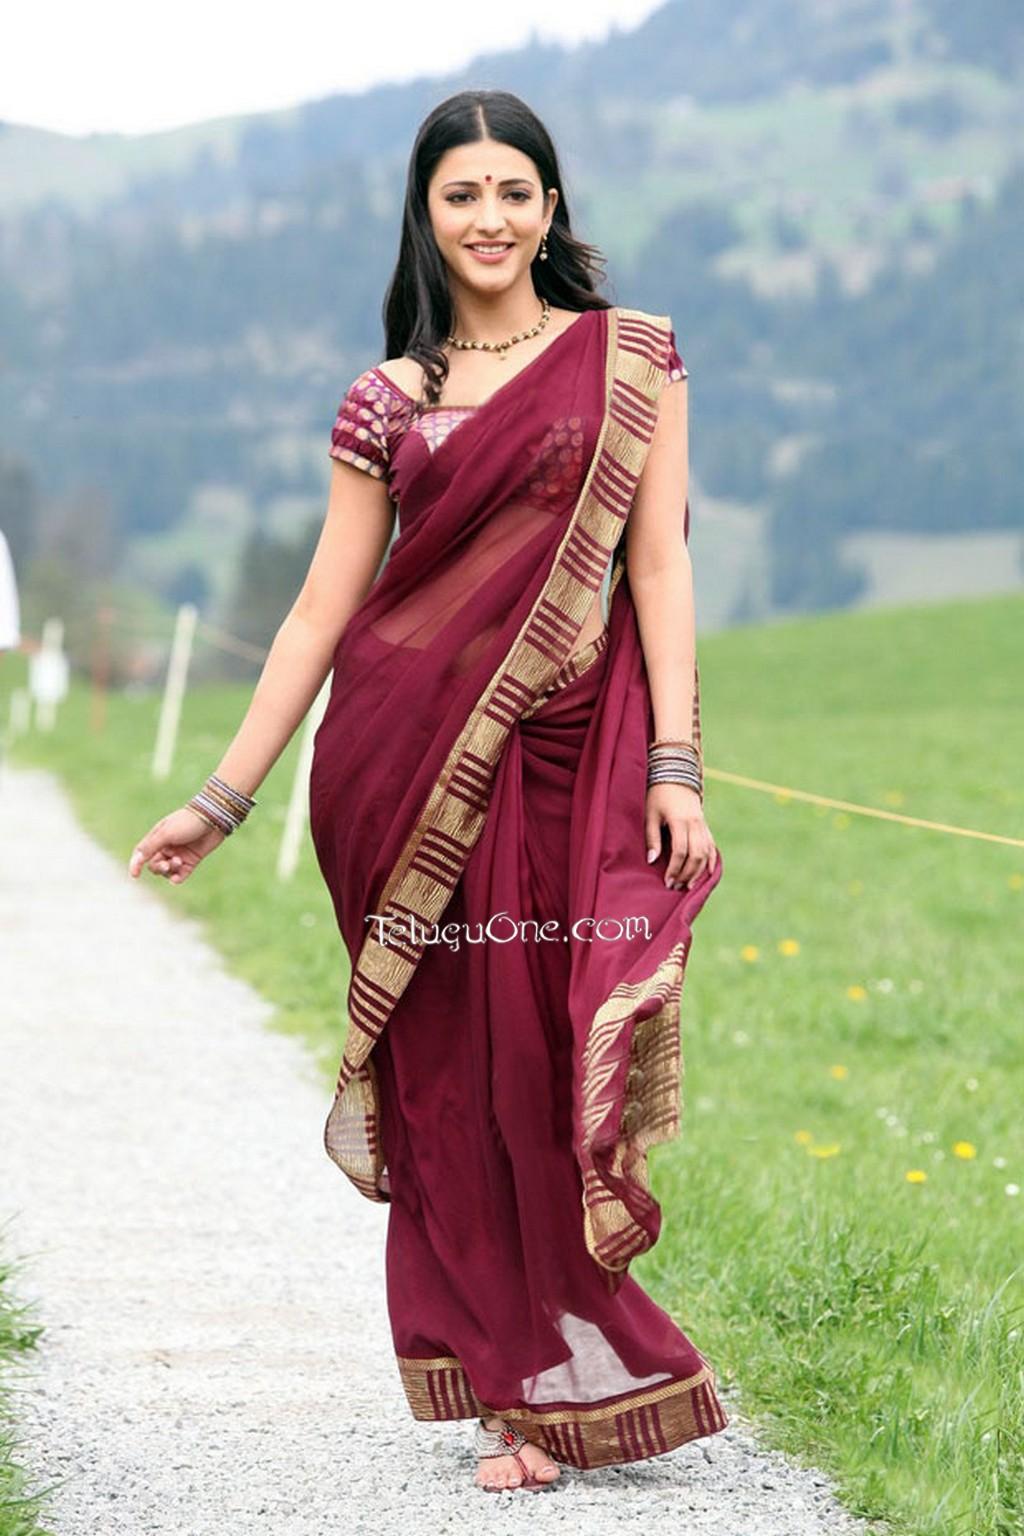 Image result for shruti hassan saree